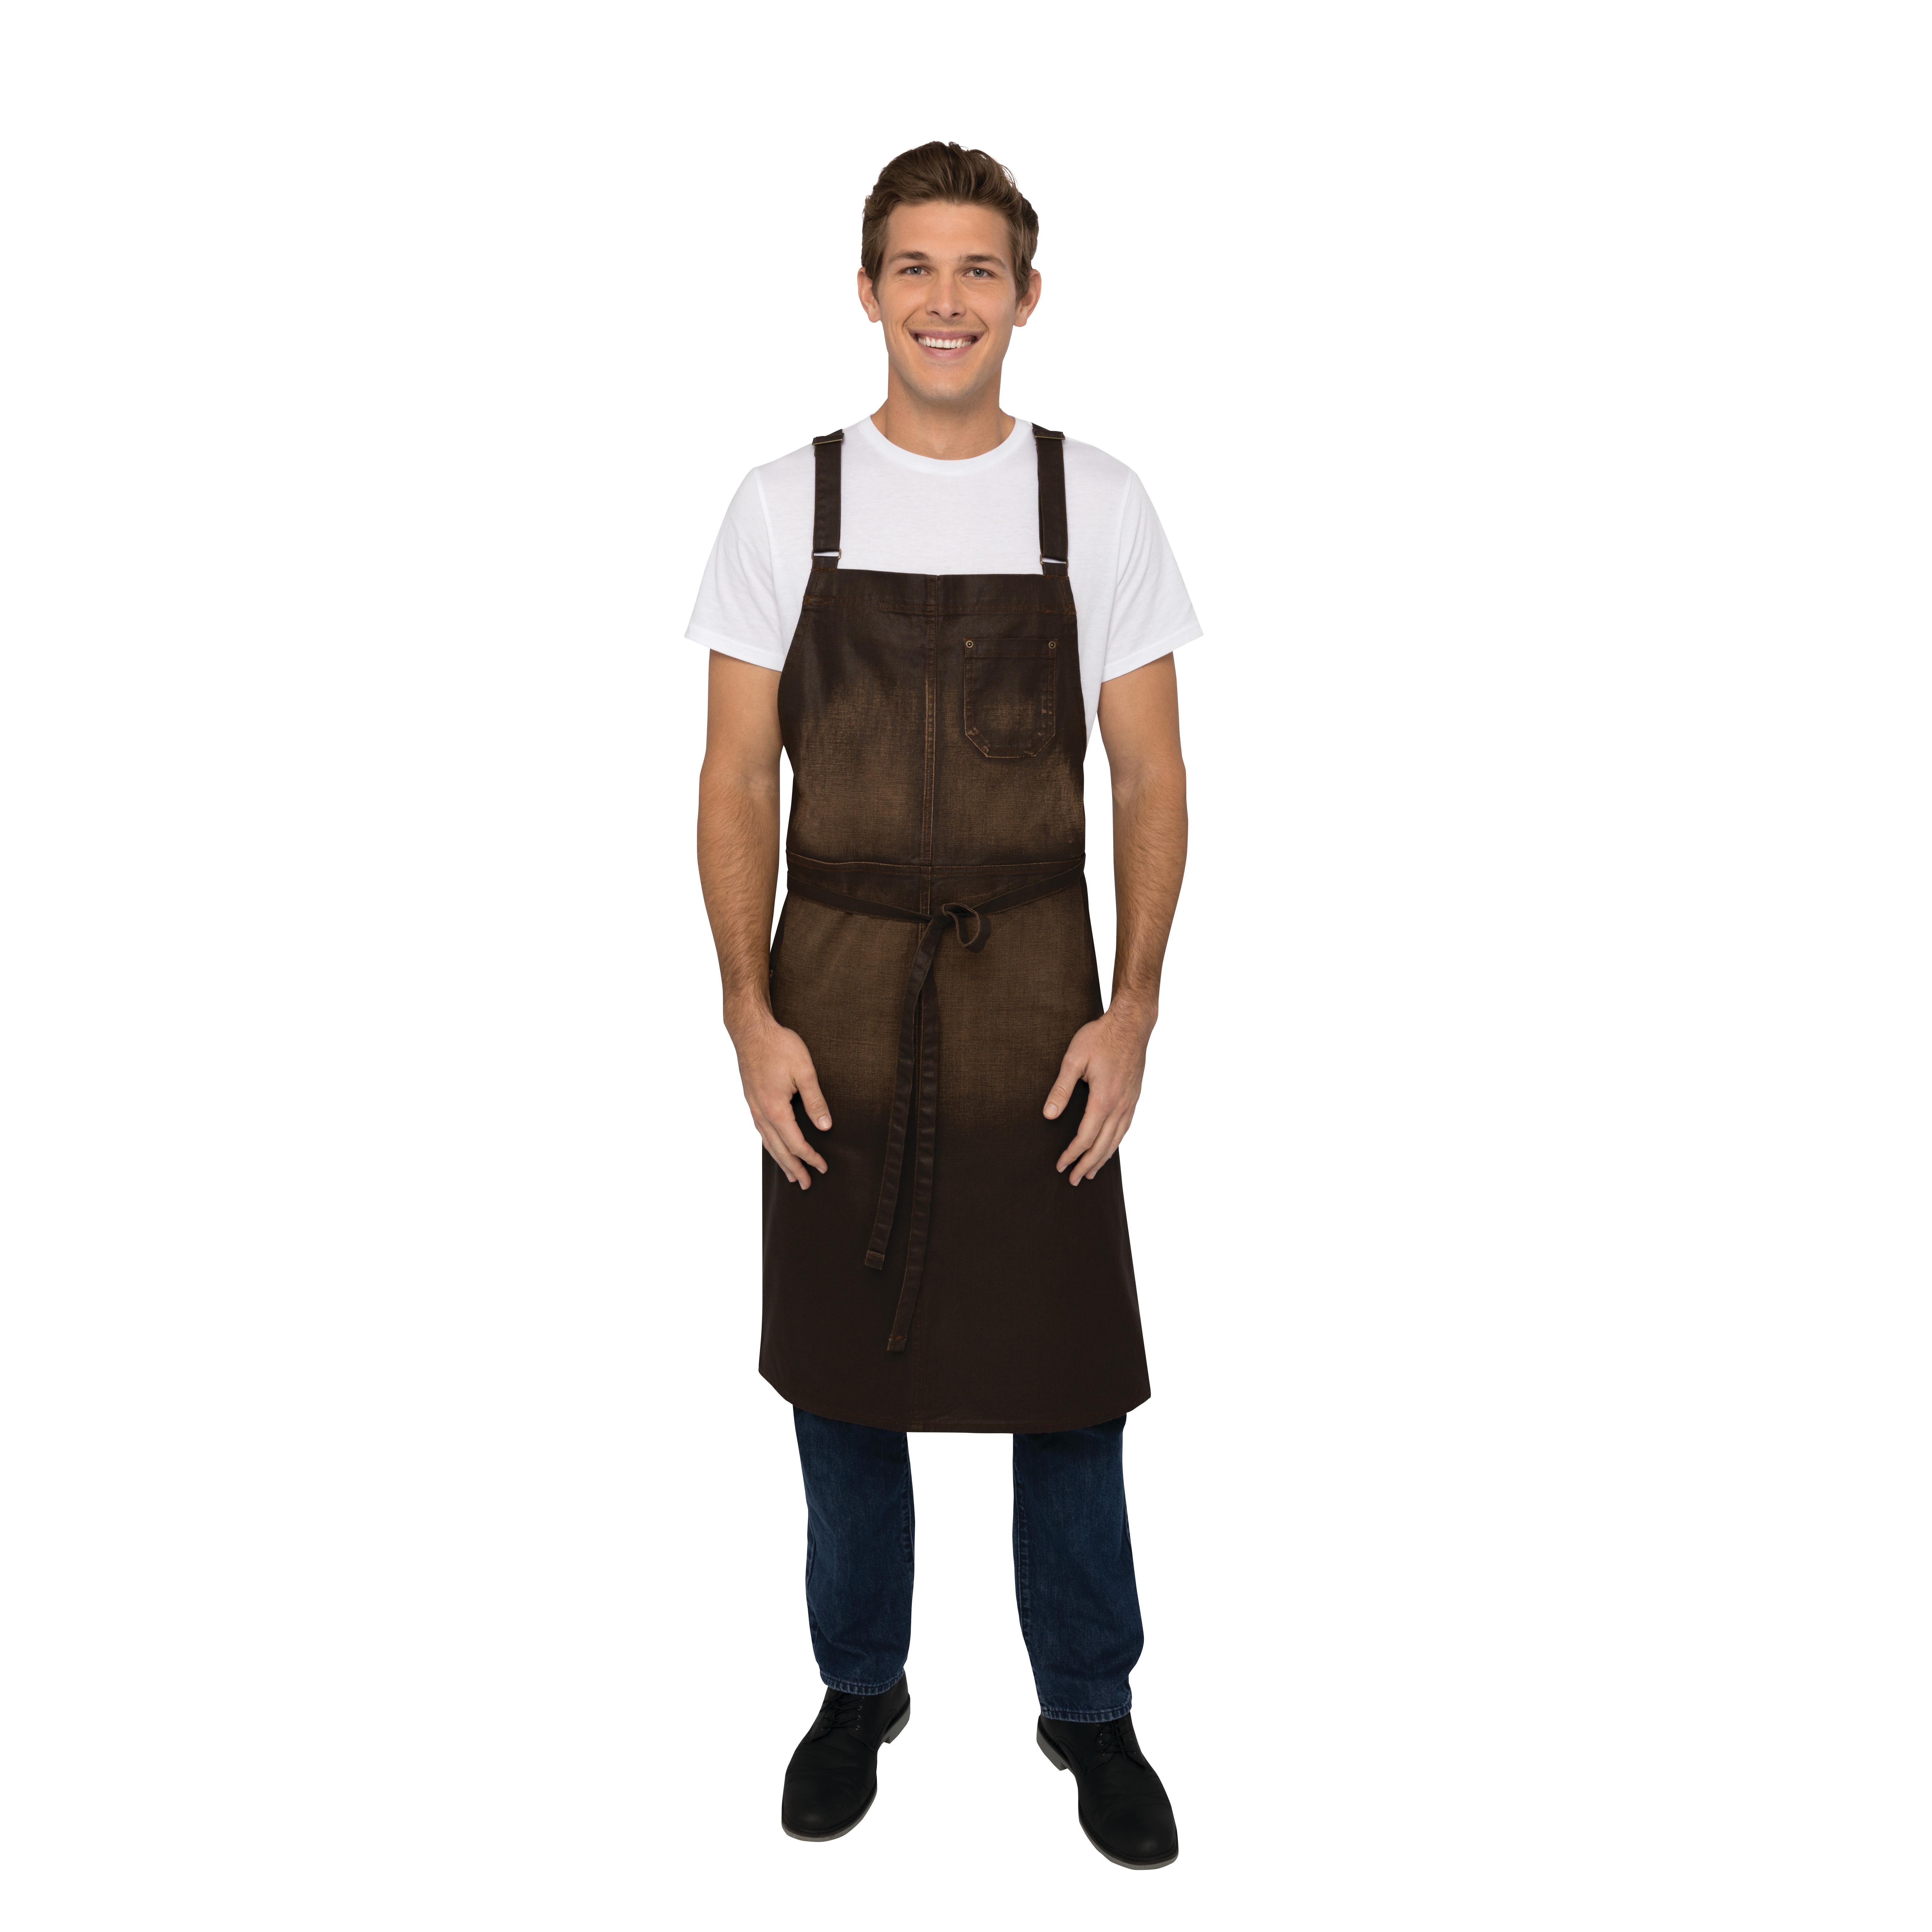 Chef Works ACX02CHO0 bib apron